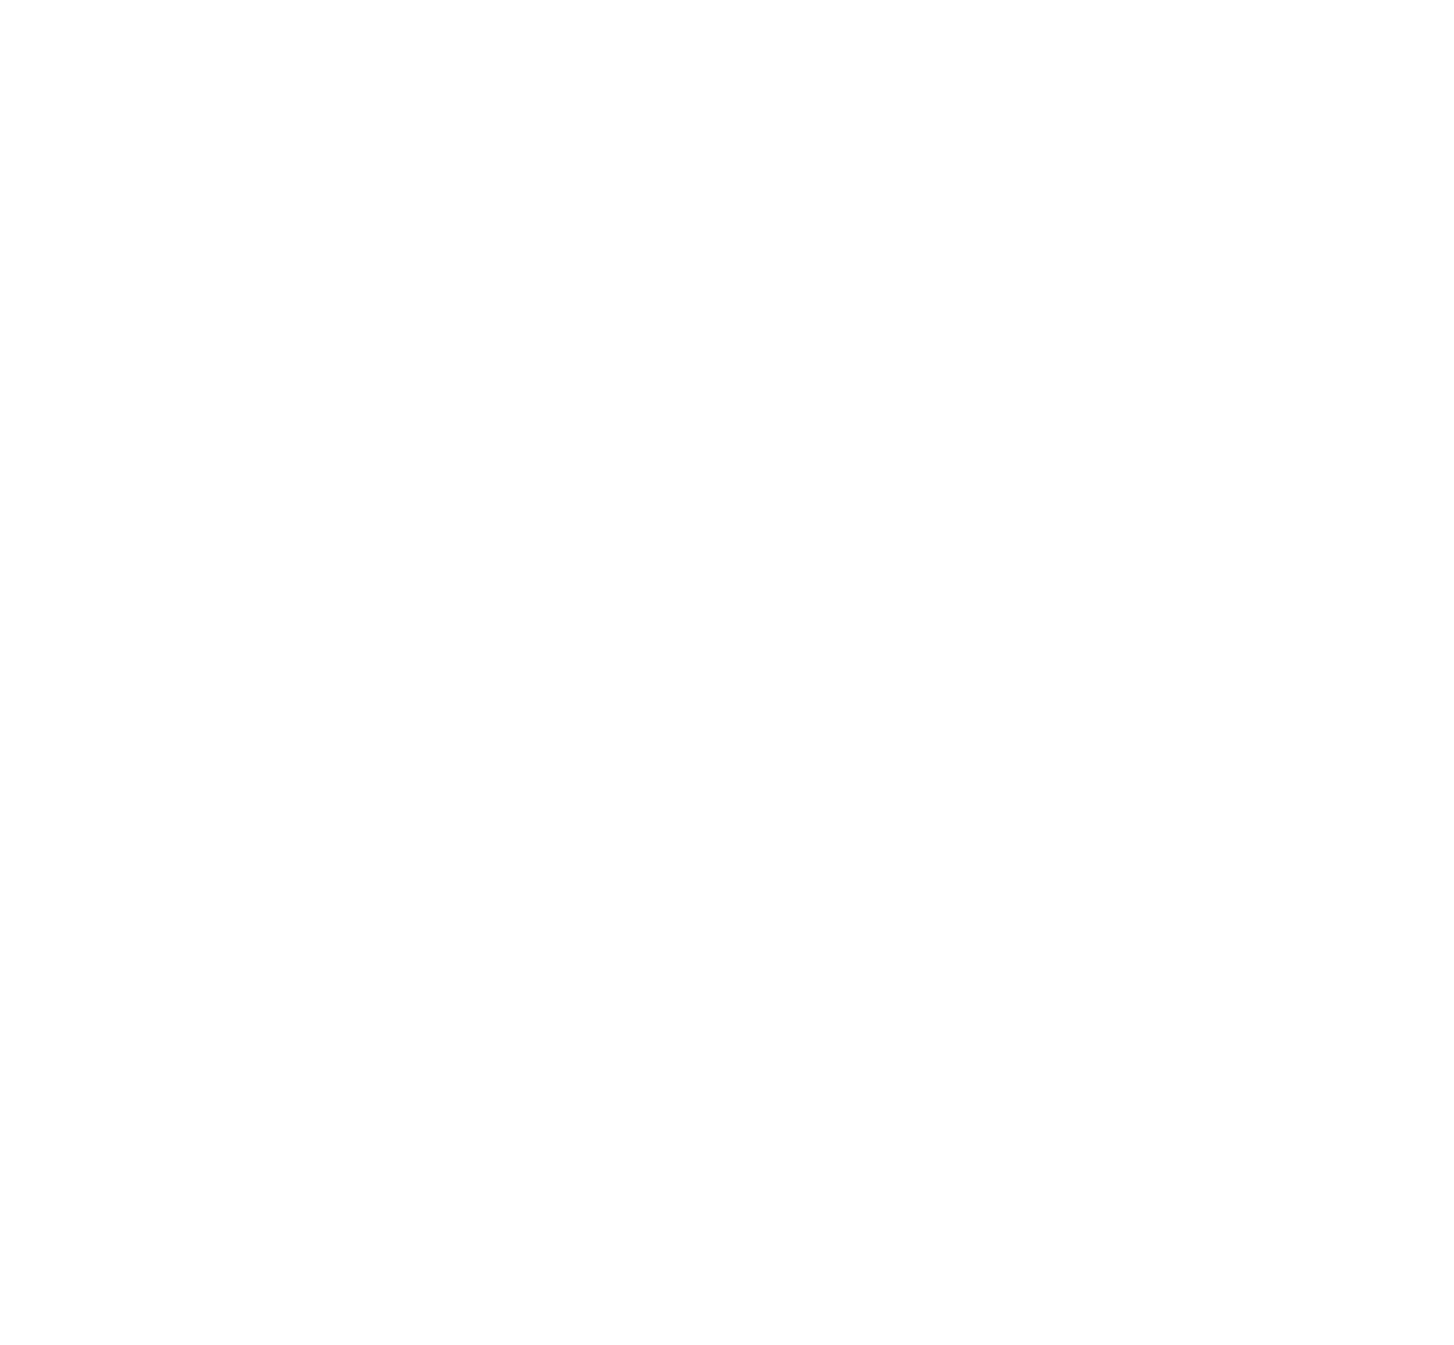 2018_CCCC_Logo_White_Transparent.png